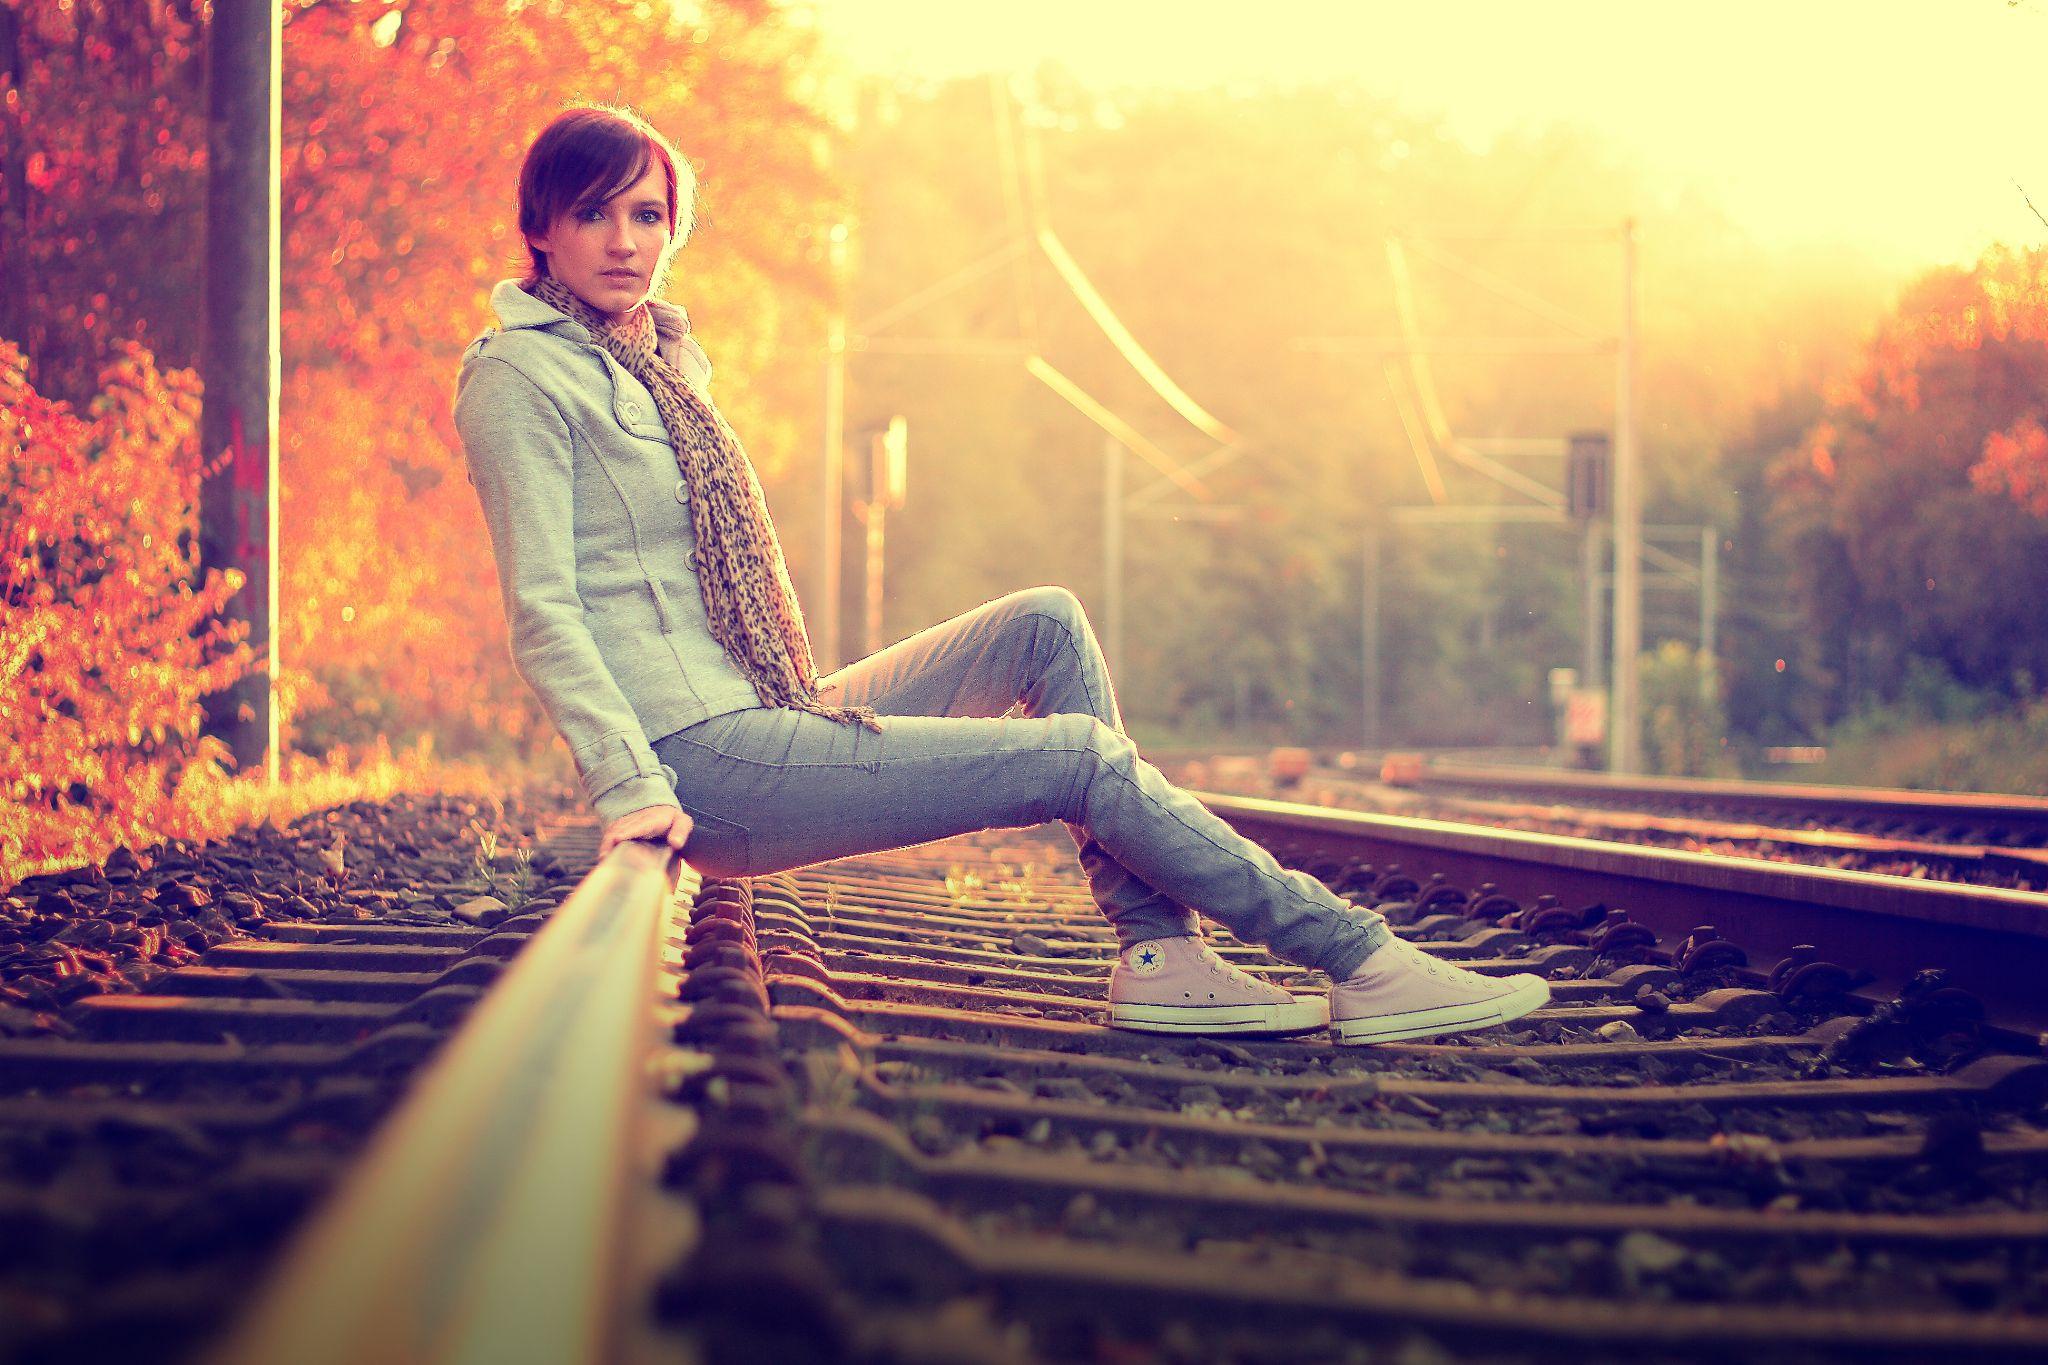 On the tracks by dennis.ynsan